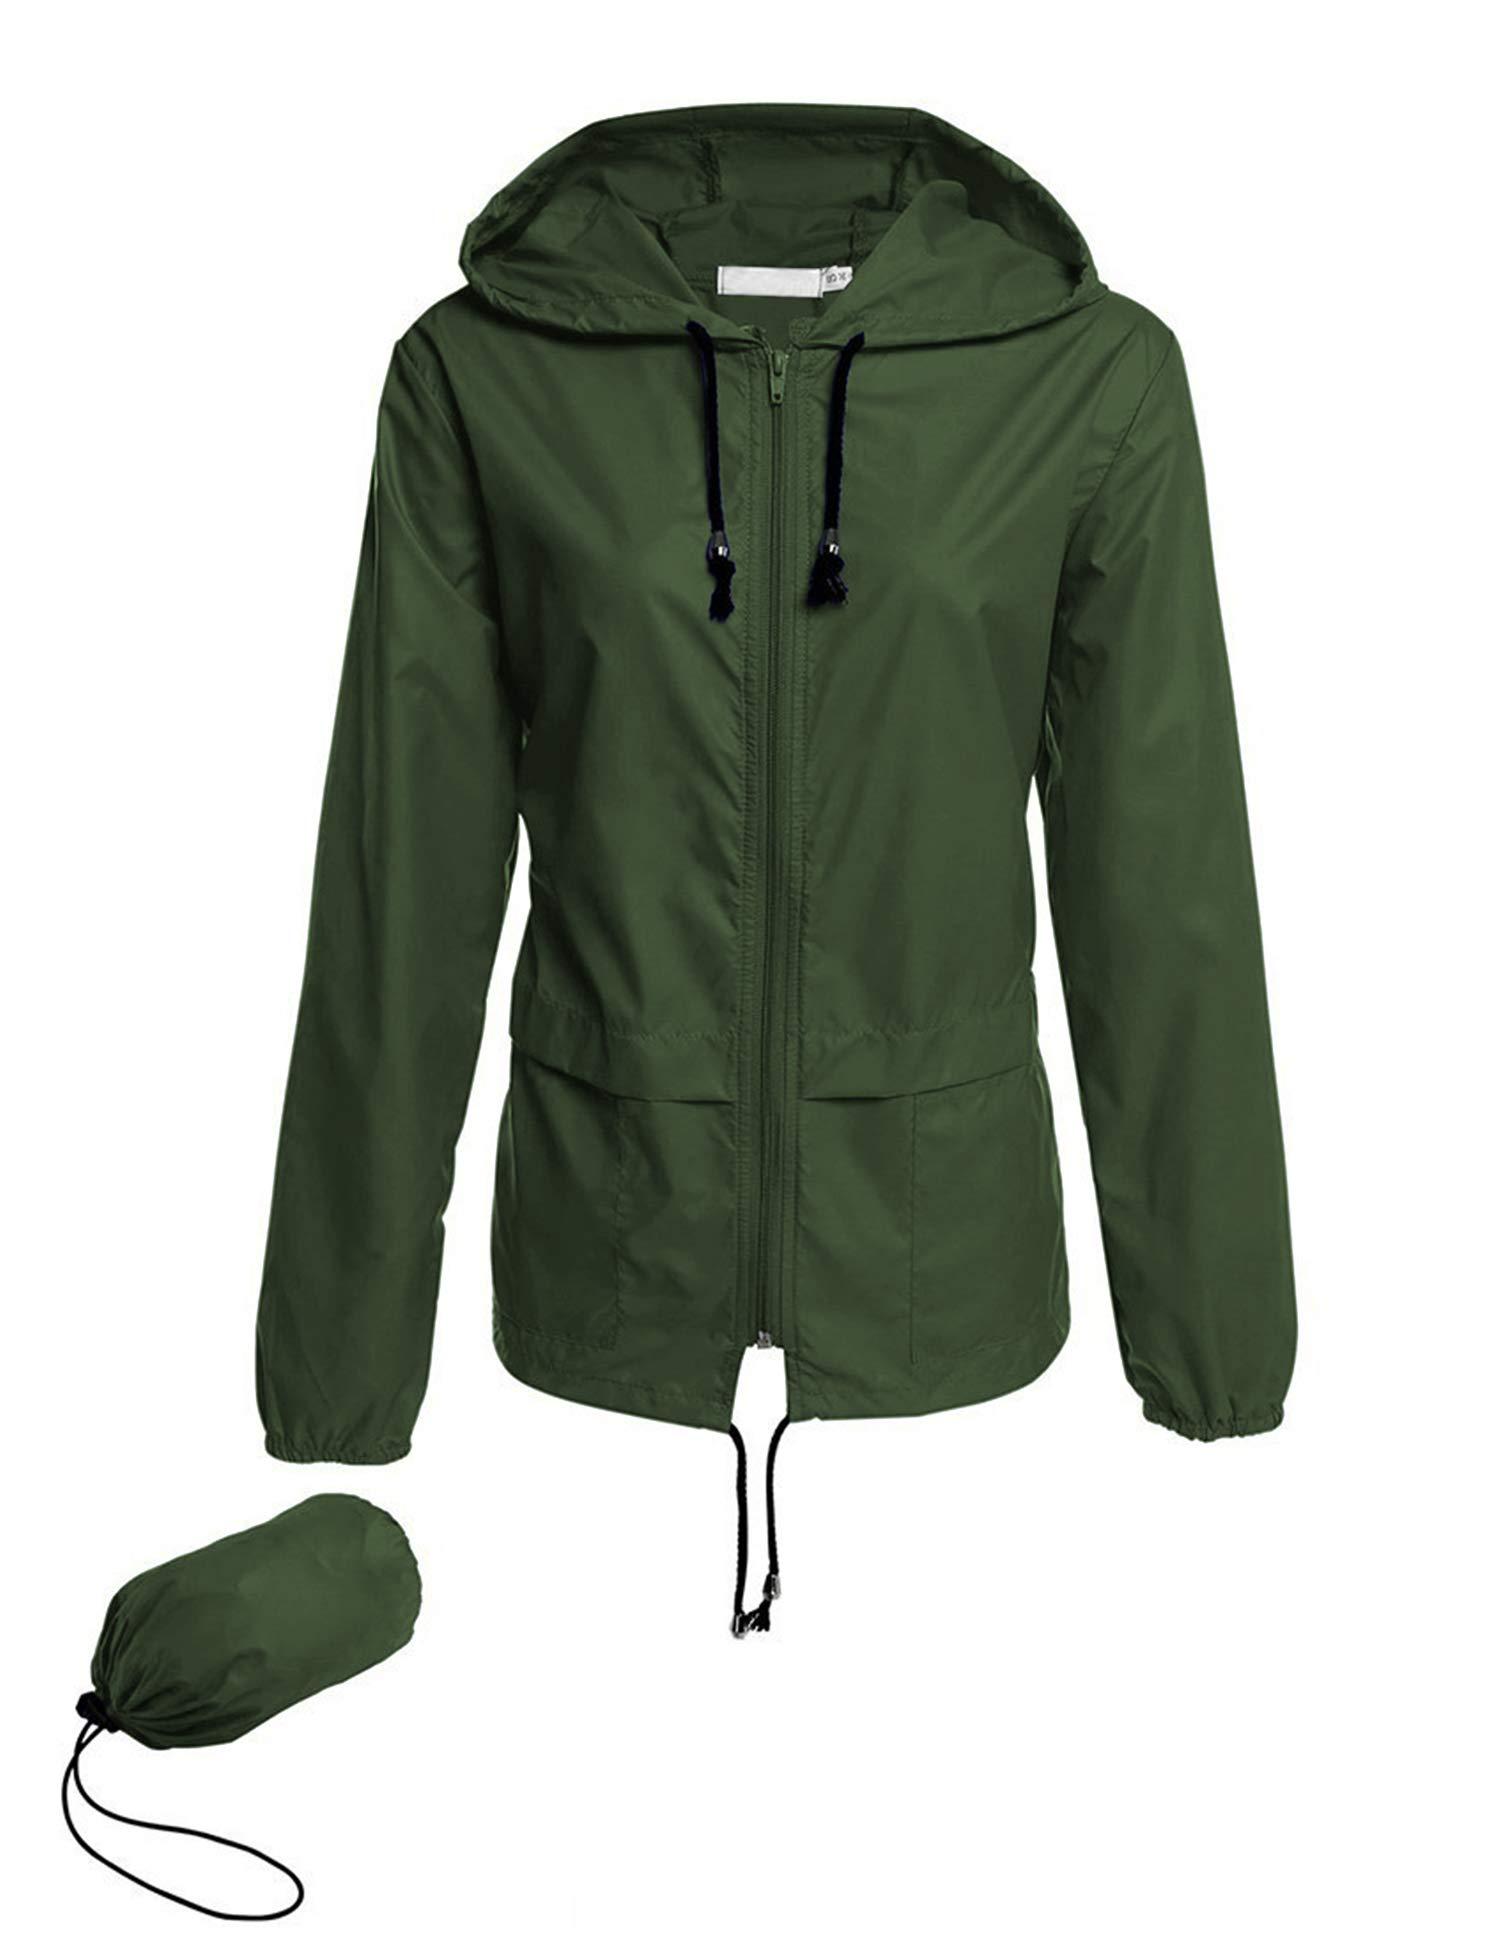 Avoogue Lightweight Raincoat Women's Waterproof Windbreaker Packable Outdoor Hooded Rain Jacket Dark Green S by Avoogue